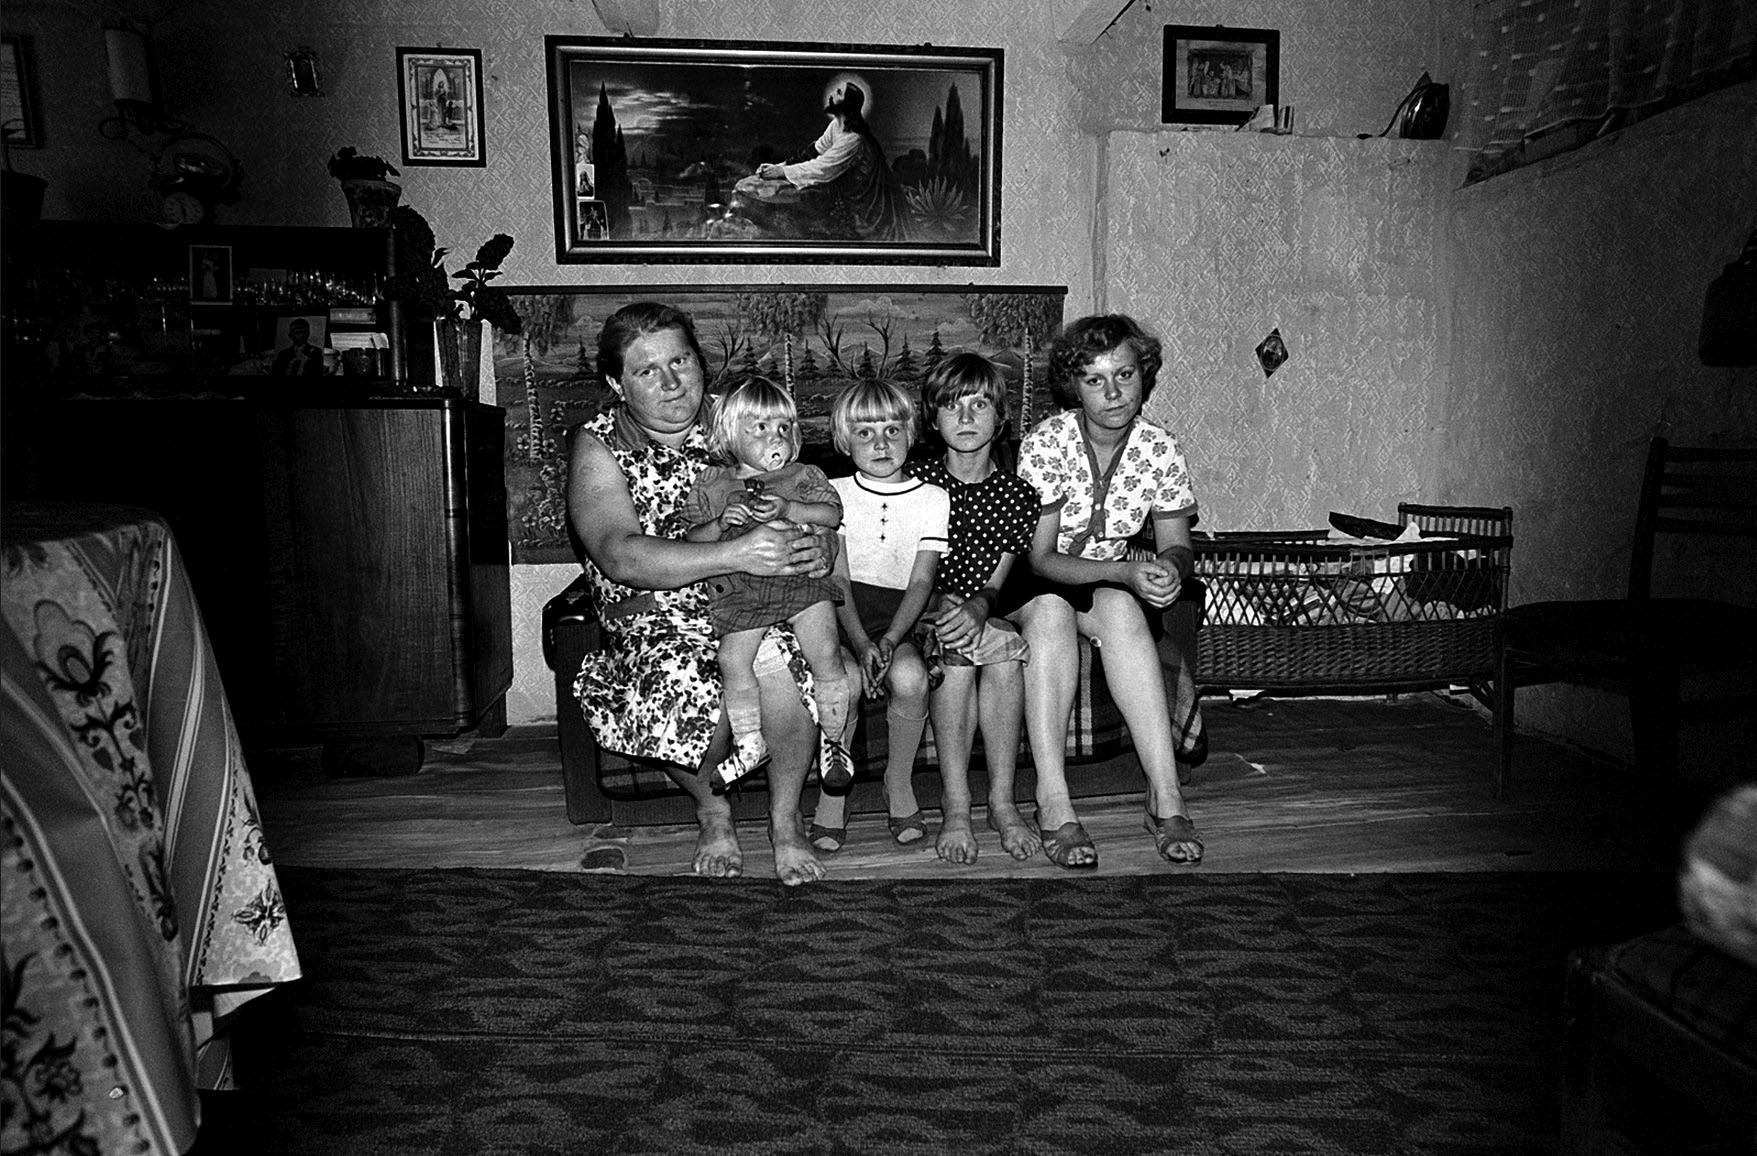 fotoblog-foto-blog-zofia-rydet-wystawa-zapis-socjologiczny-2